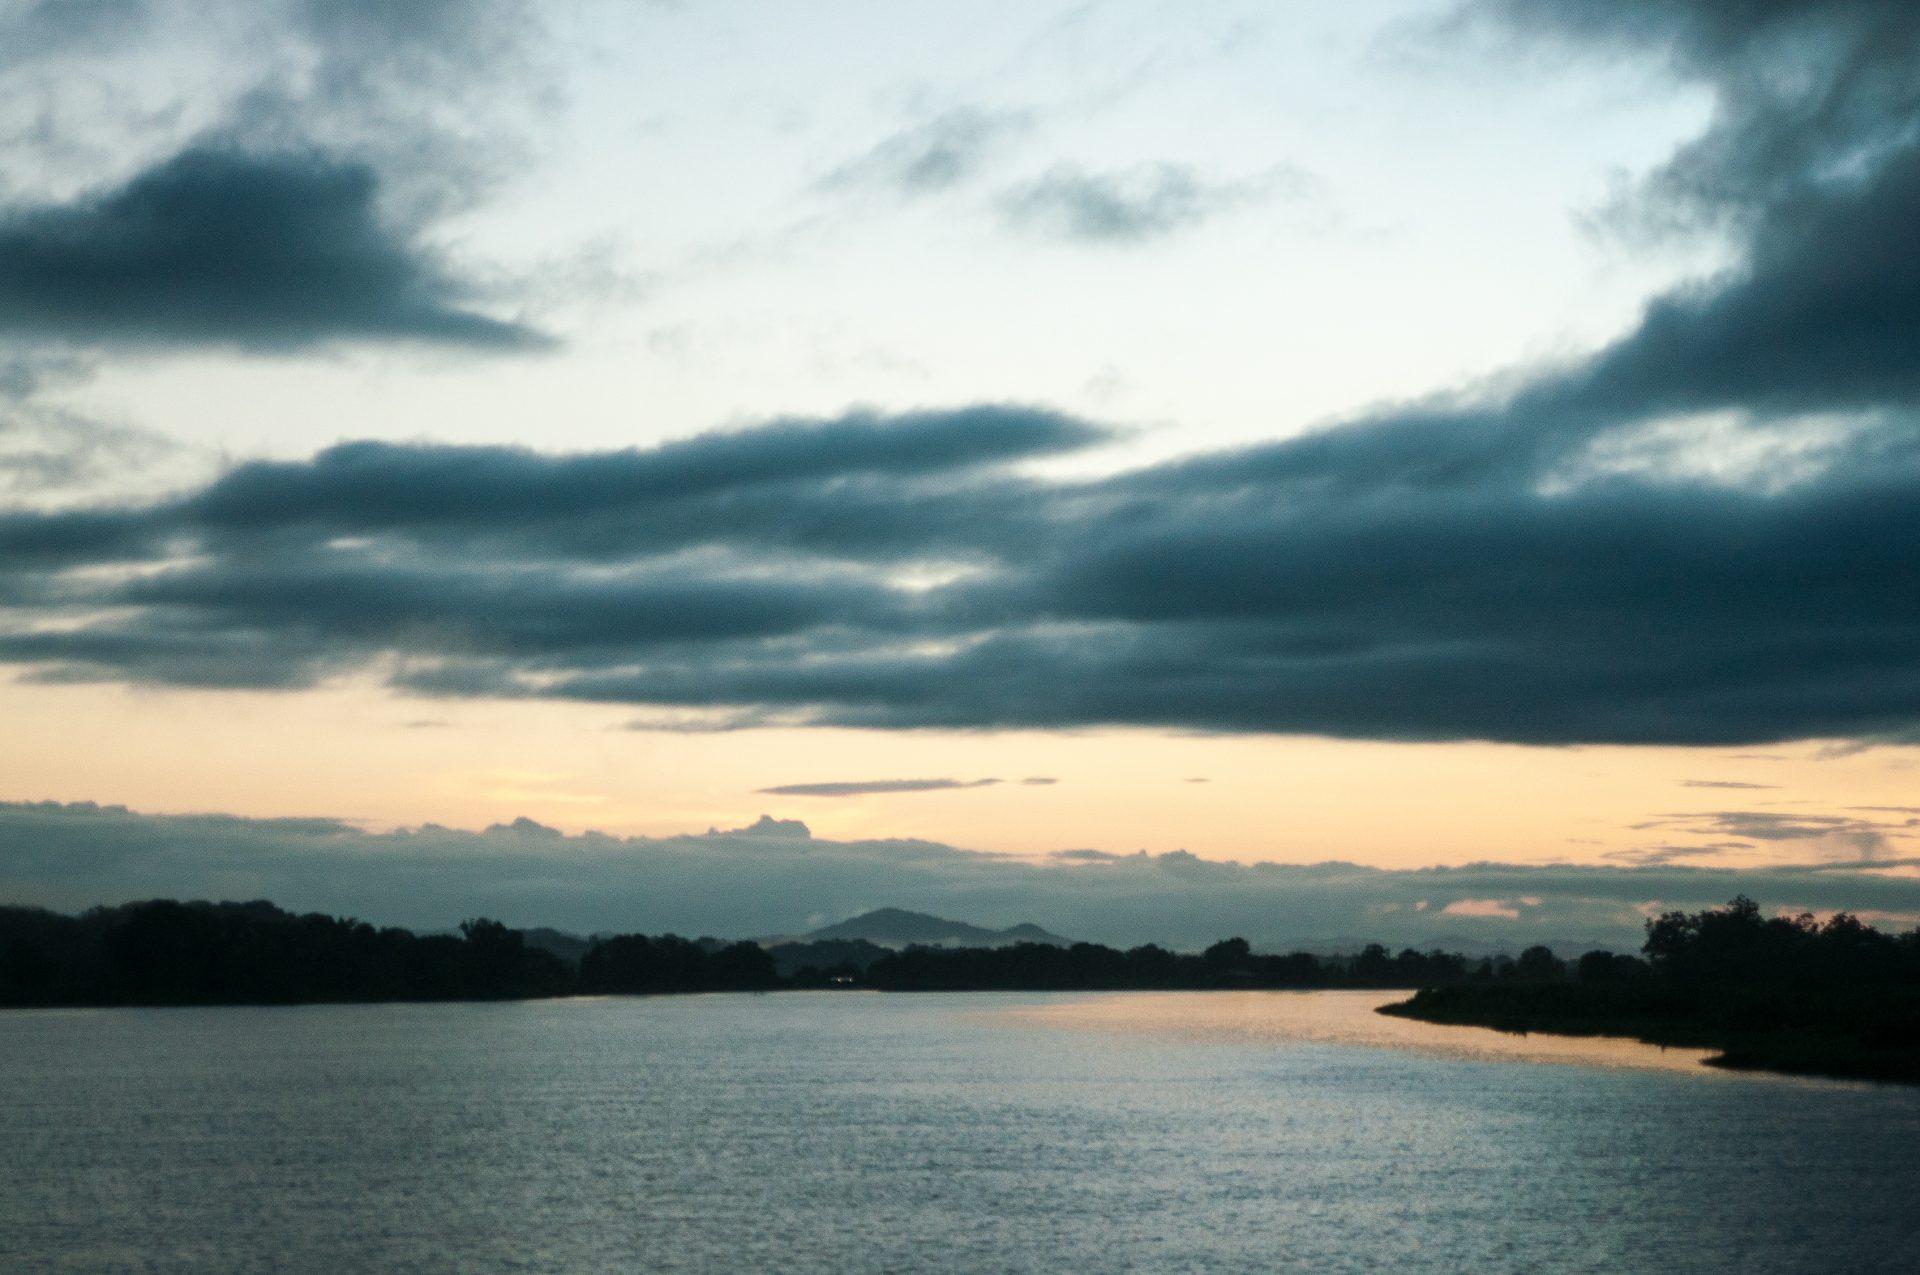 Rio san juan lever soleil